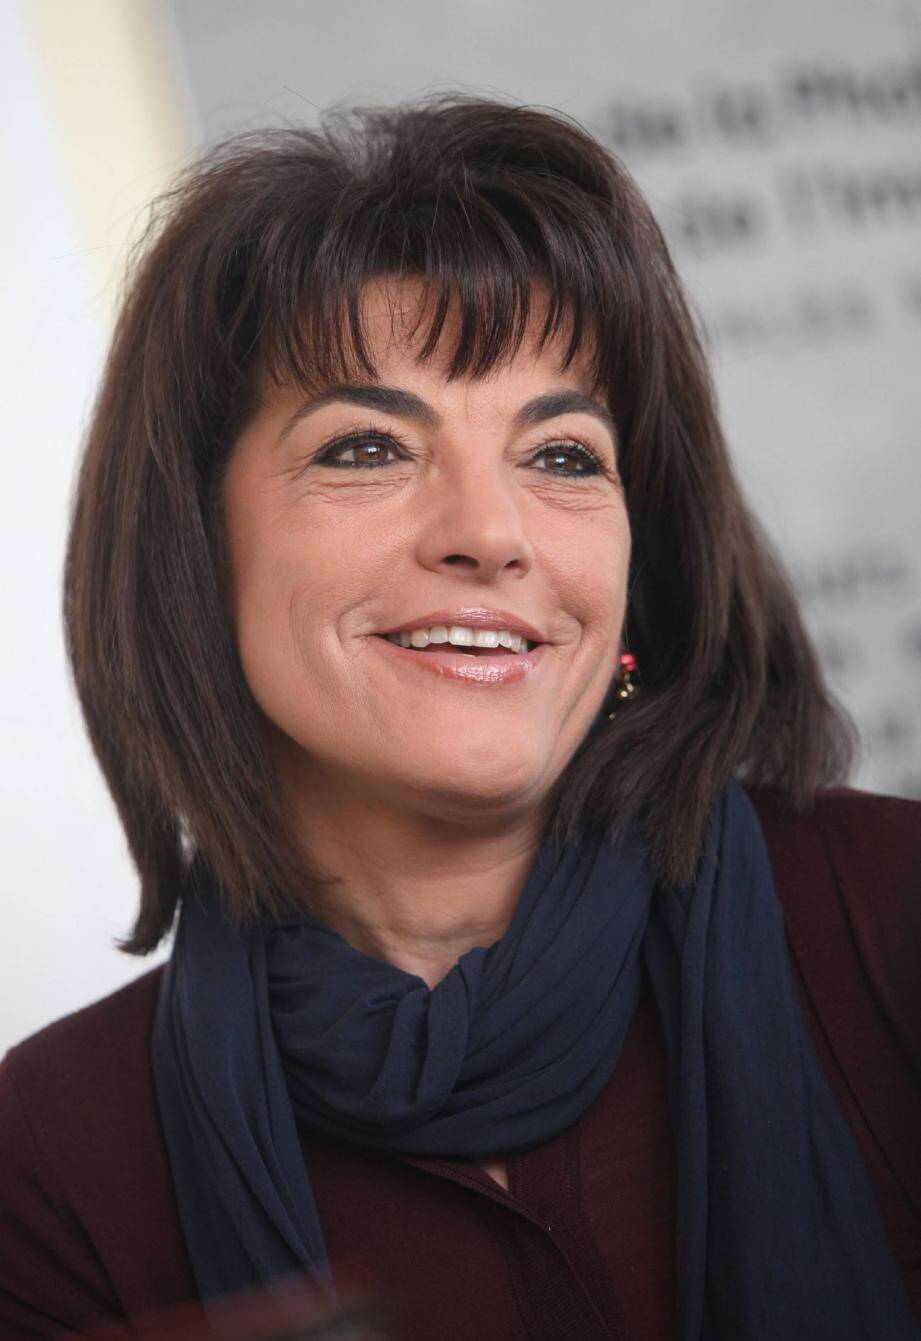 Dominique Estrosi-Sassone garde espoir que le Conseil d'Etat validera son élection dans le 14e canton.